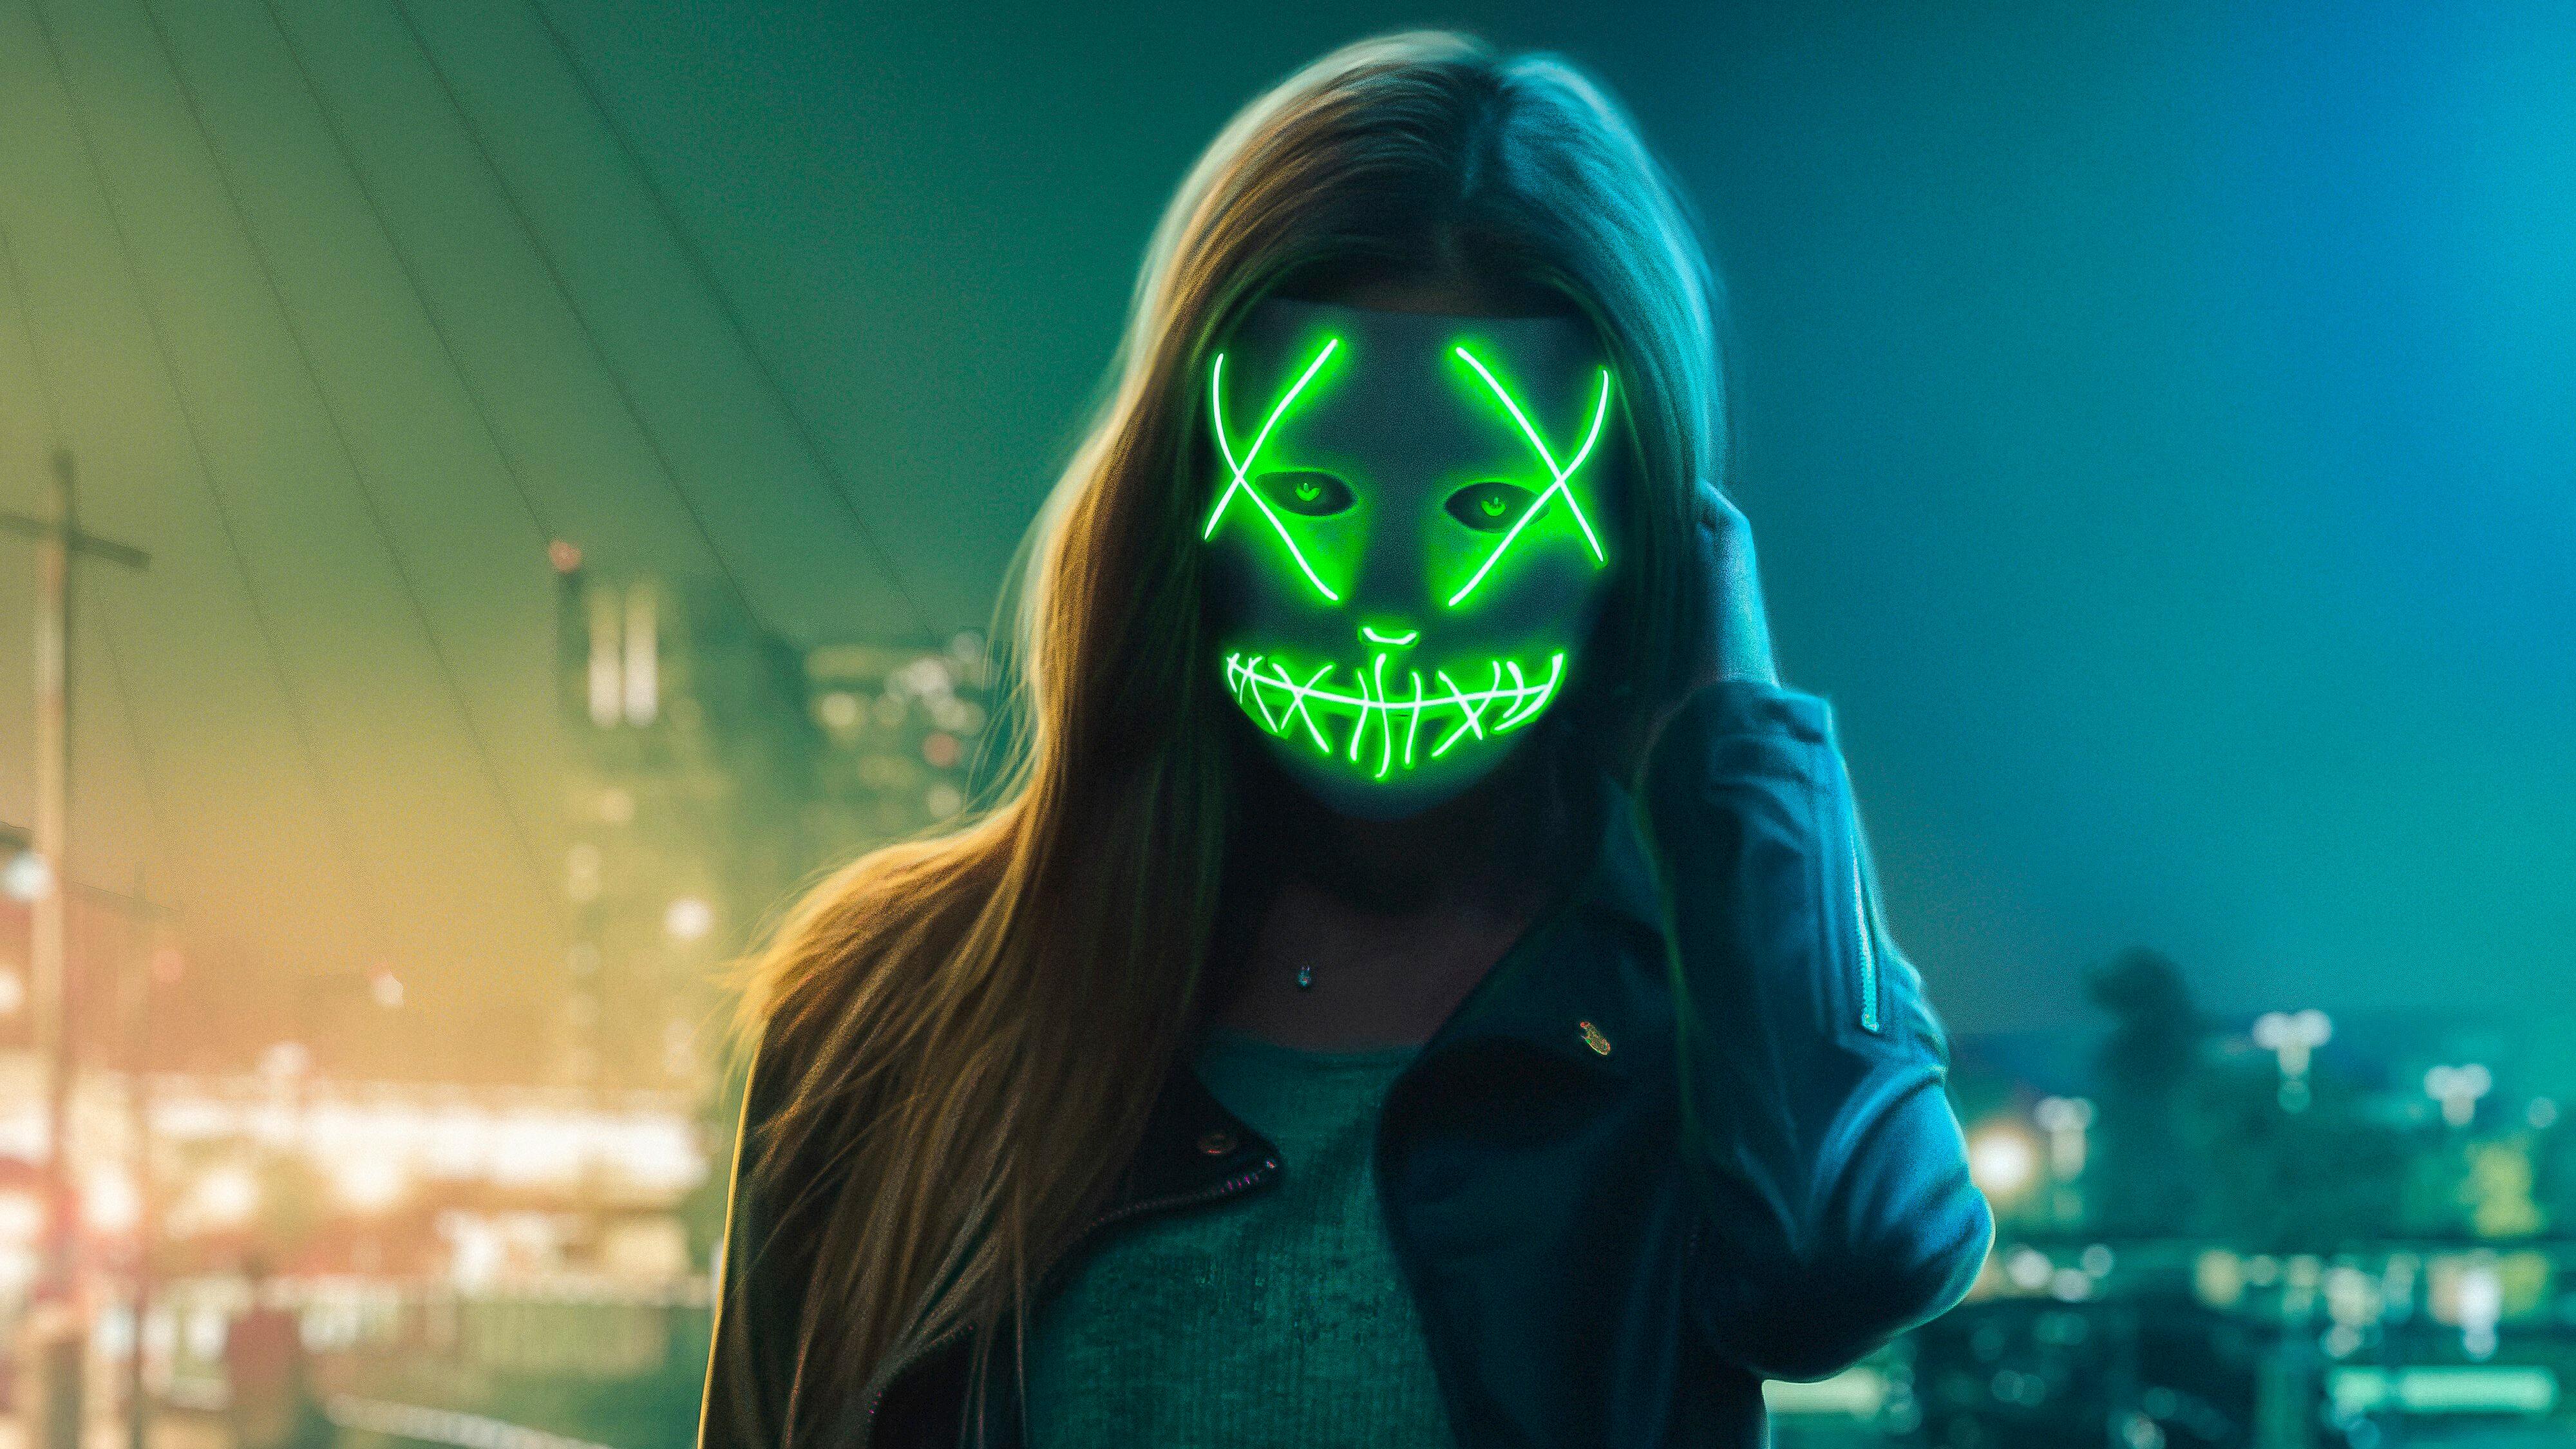 Neon Eye Mask Girl, HD Artist, 4k Wallpapers, Images ...